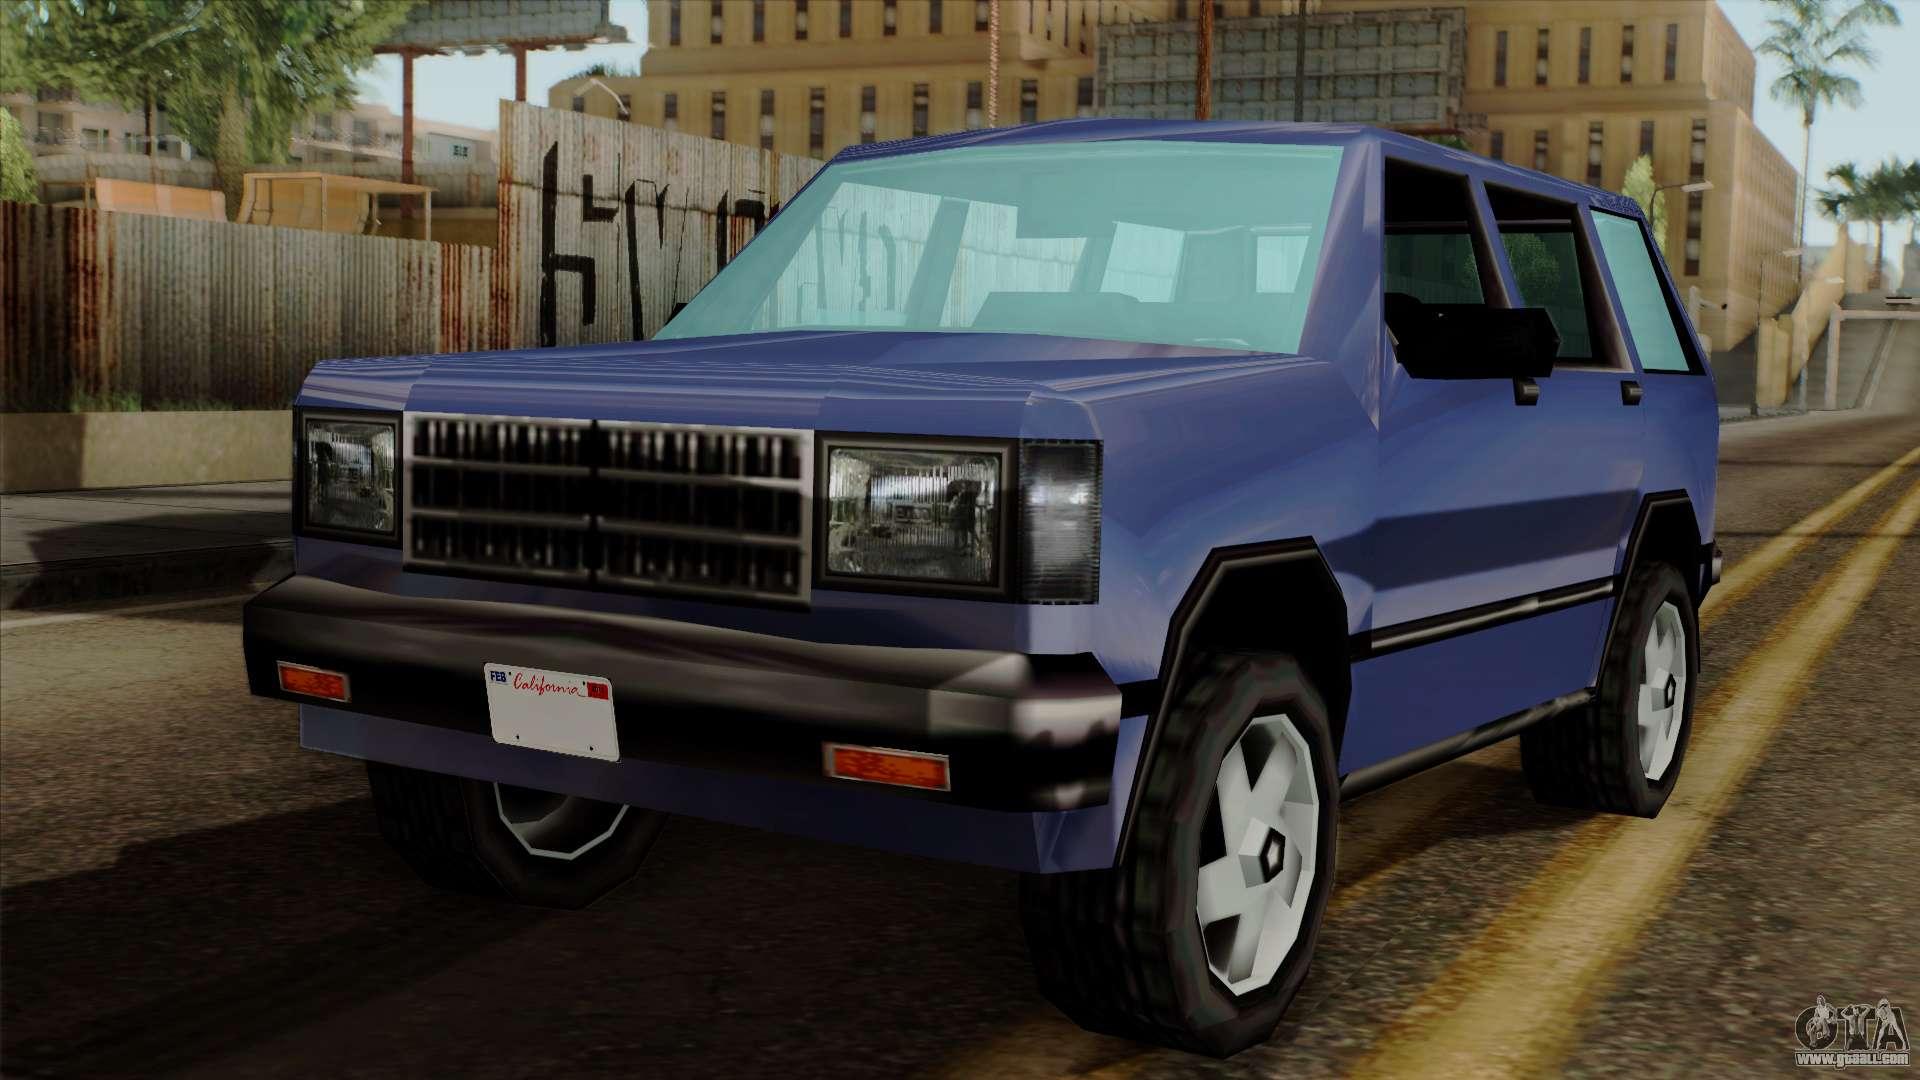 Gta Vice City Car Landstalker